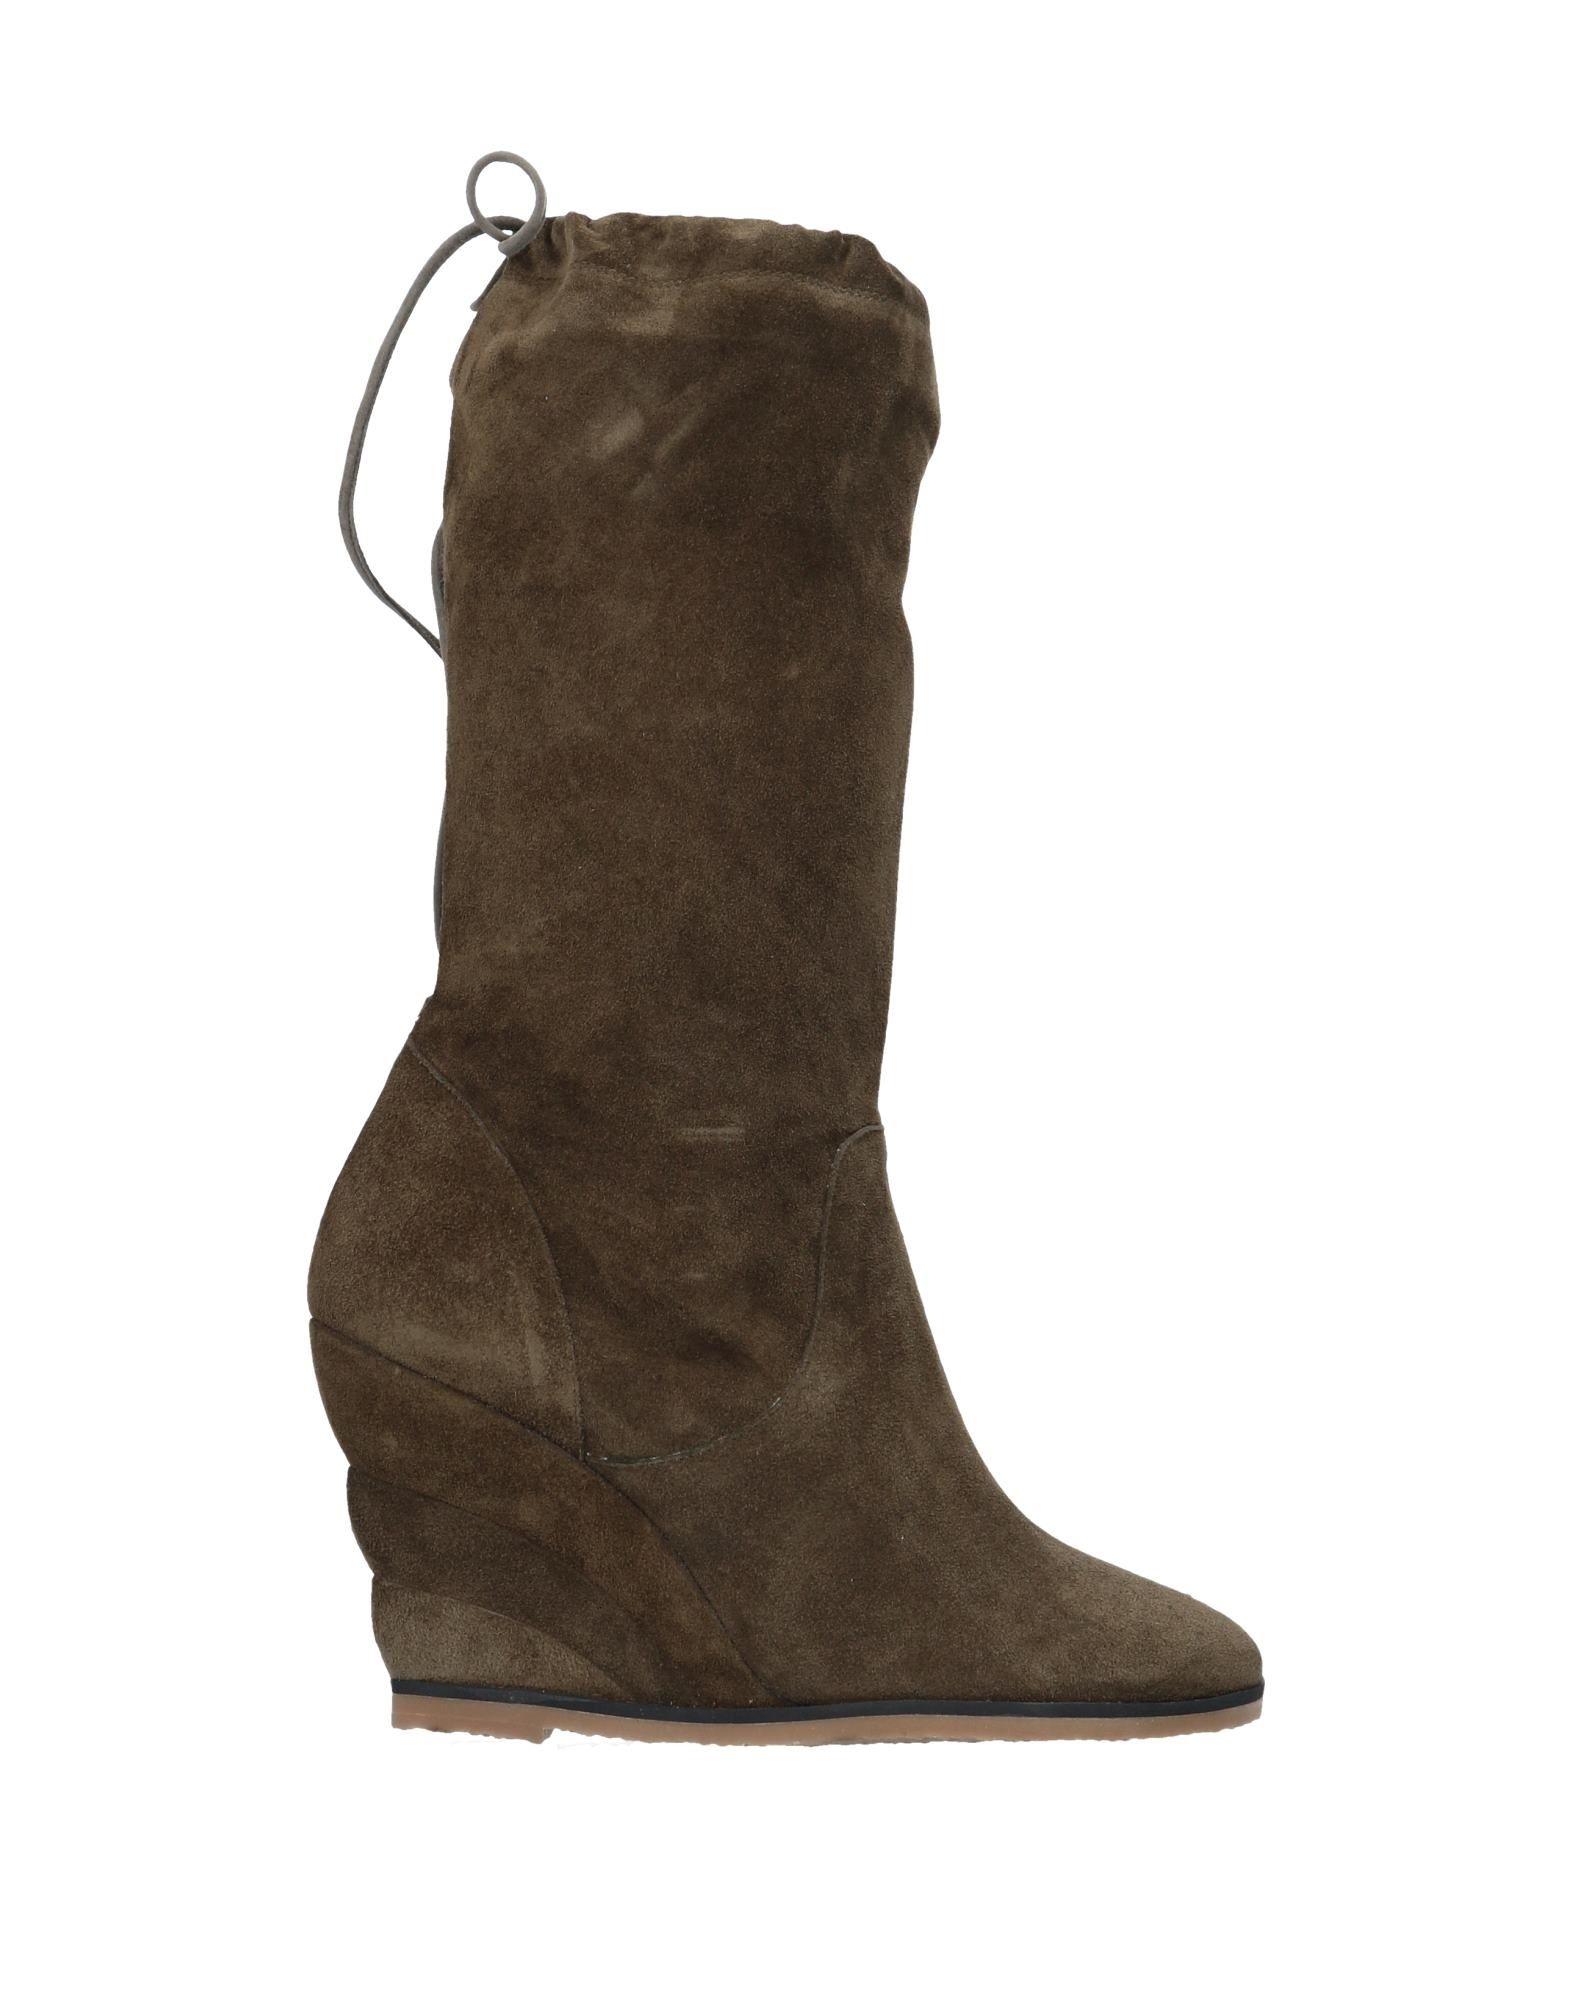 Hannibal Laguna Ankle Laguna Boot - Women Hannibal Laguna Ankle Ankle Boots online on  Australia - 11542089GA 384595